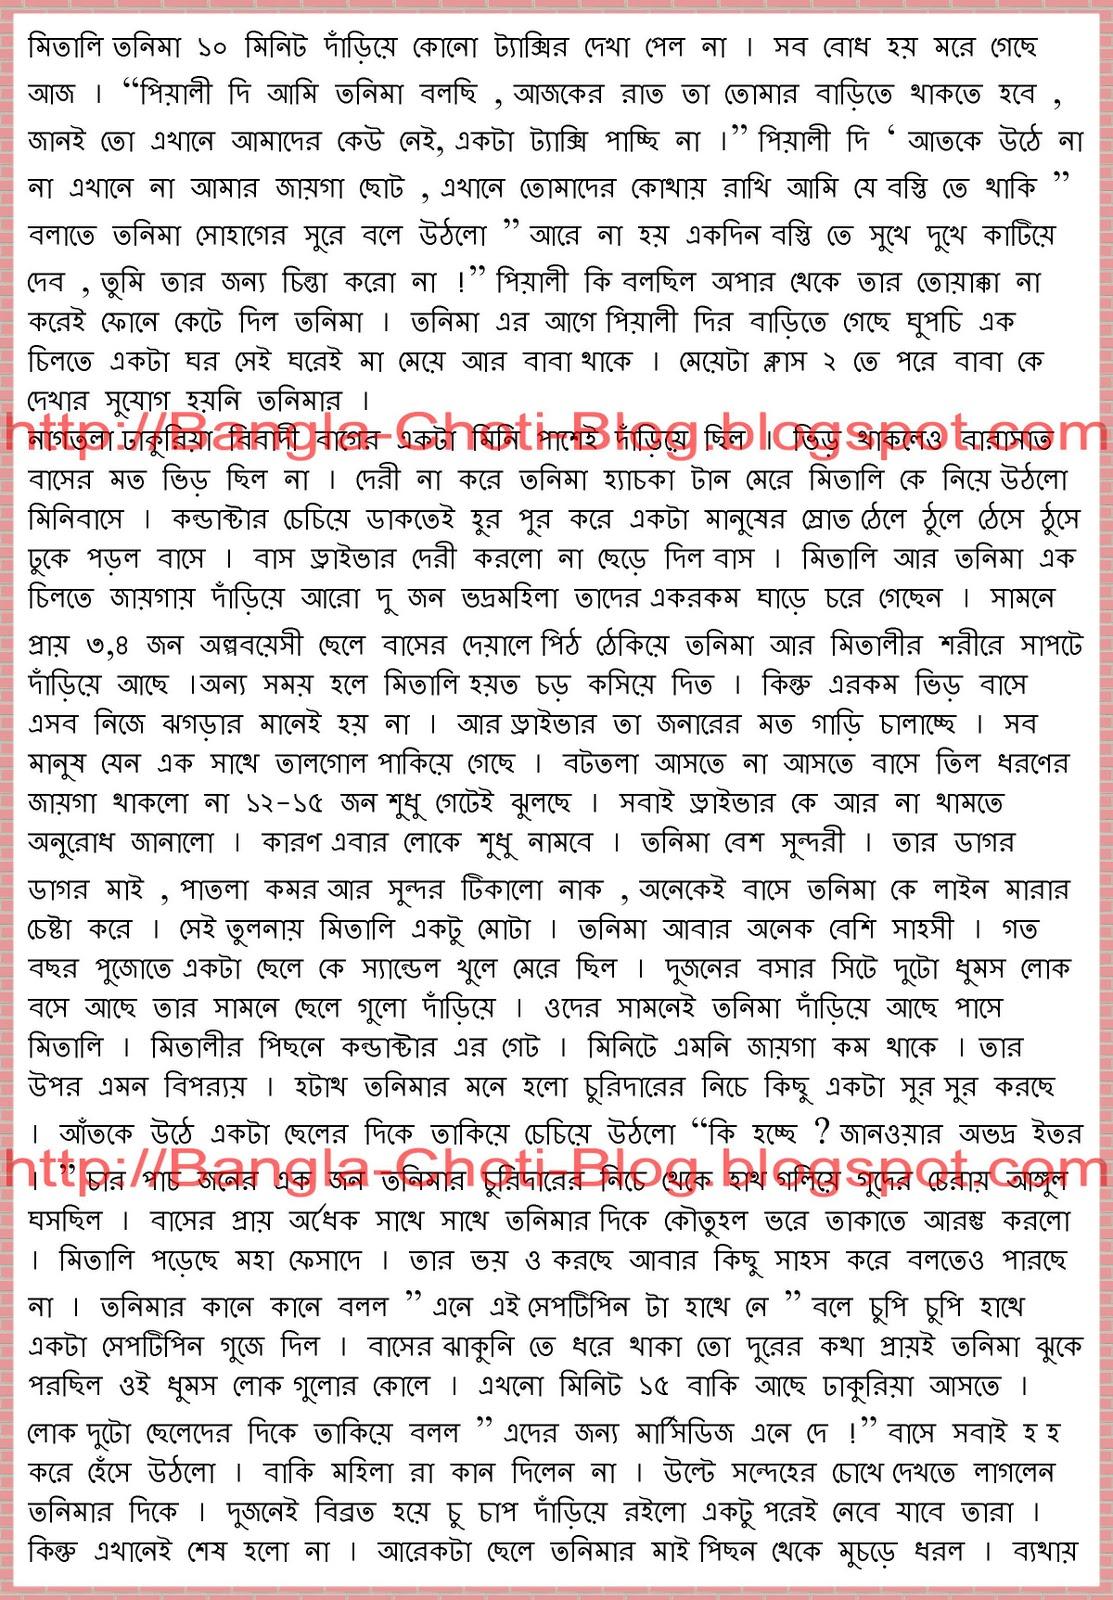 Xxx bangla choti photo - New porno